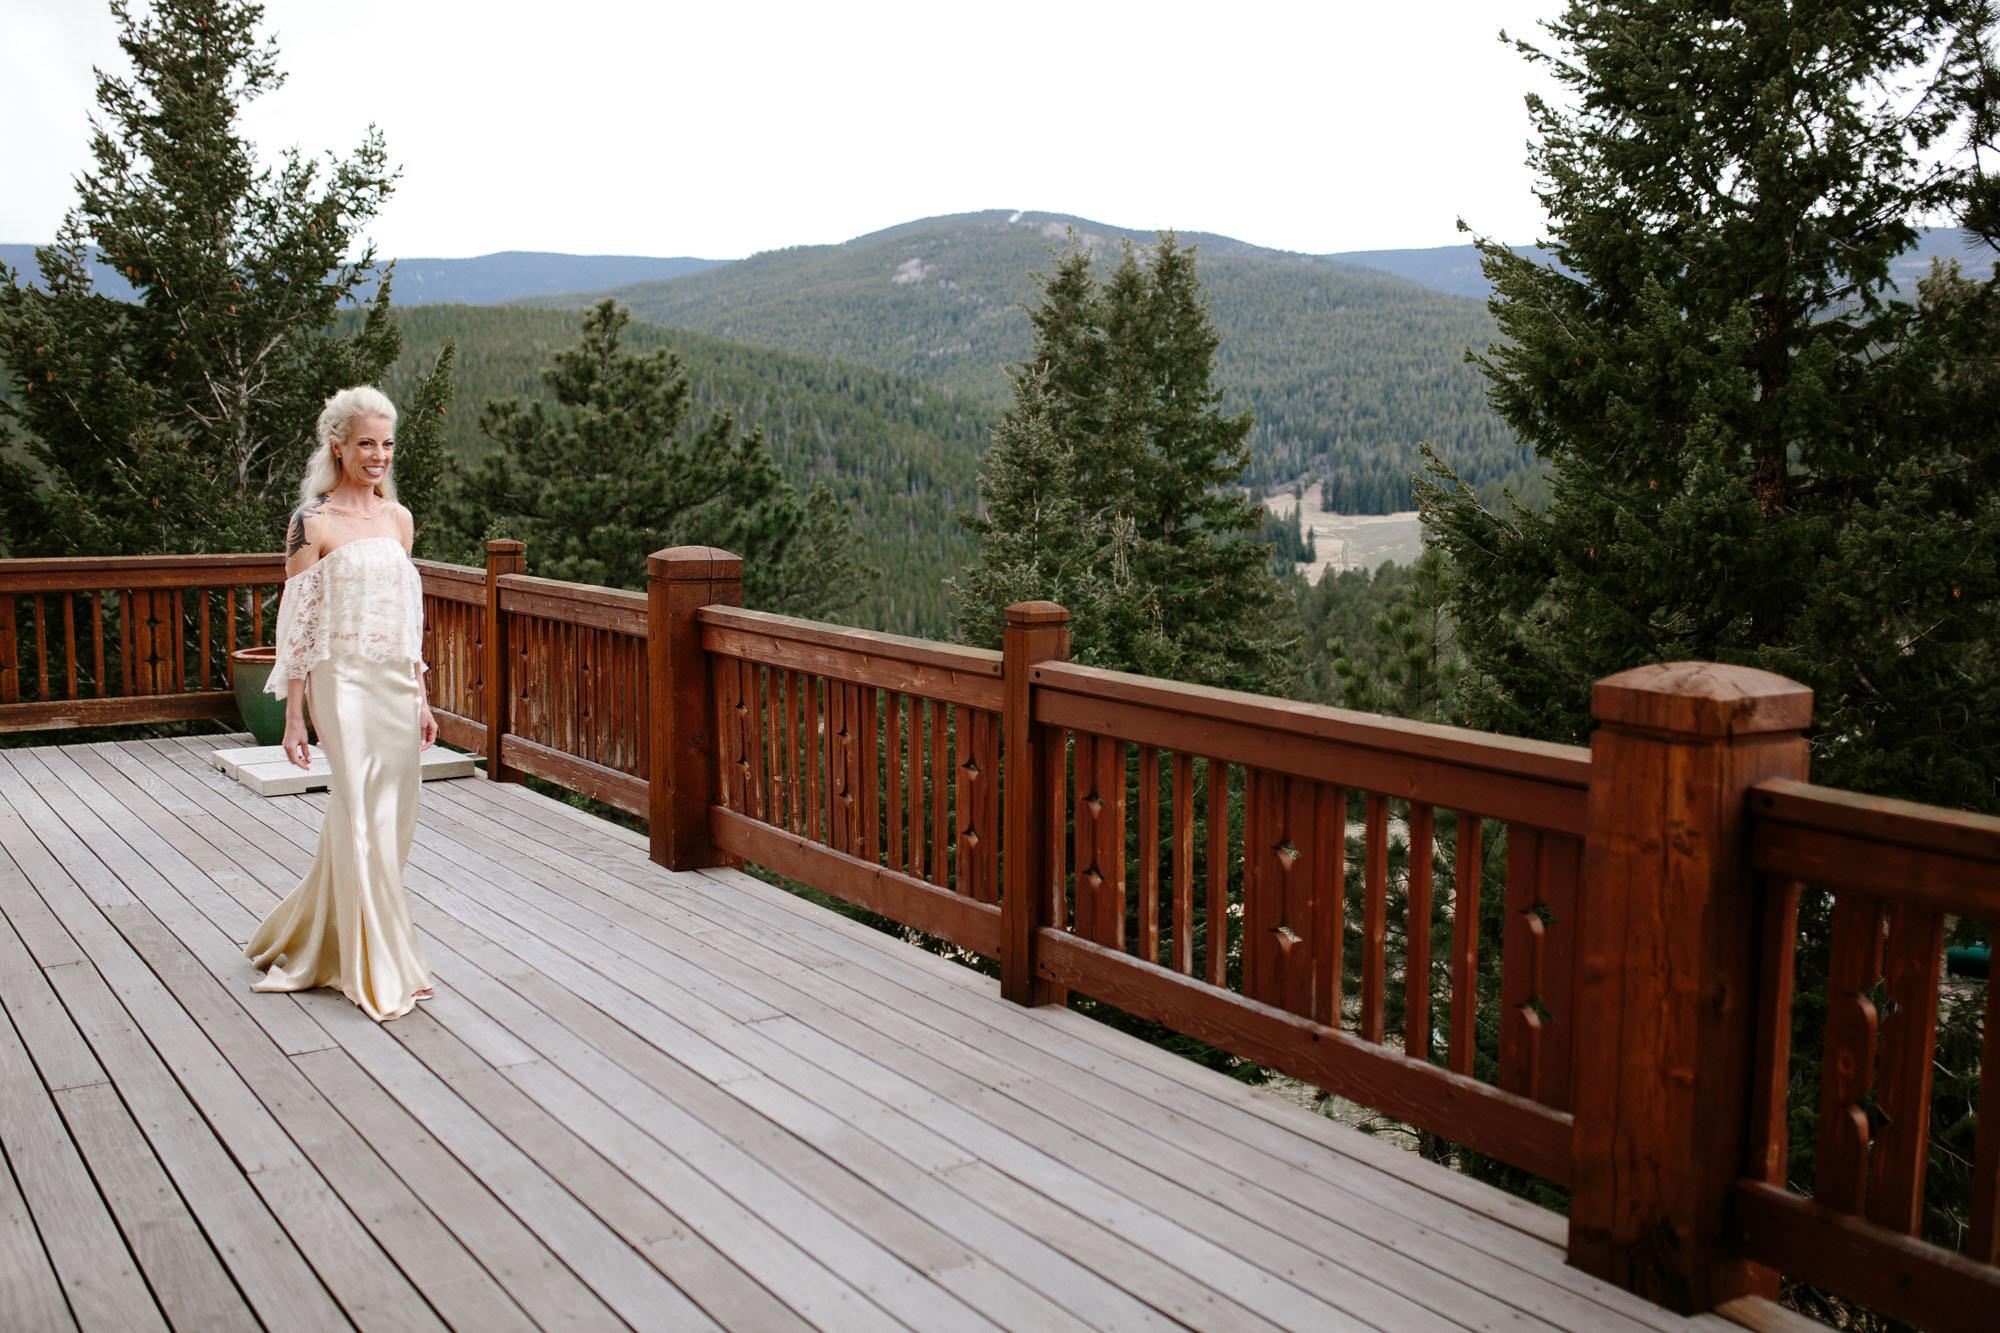 bucci-barn-wedding-elopement-evergreen-boulder-denver-colorado-adventerous-romantic-timeless-032.jpg